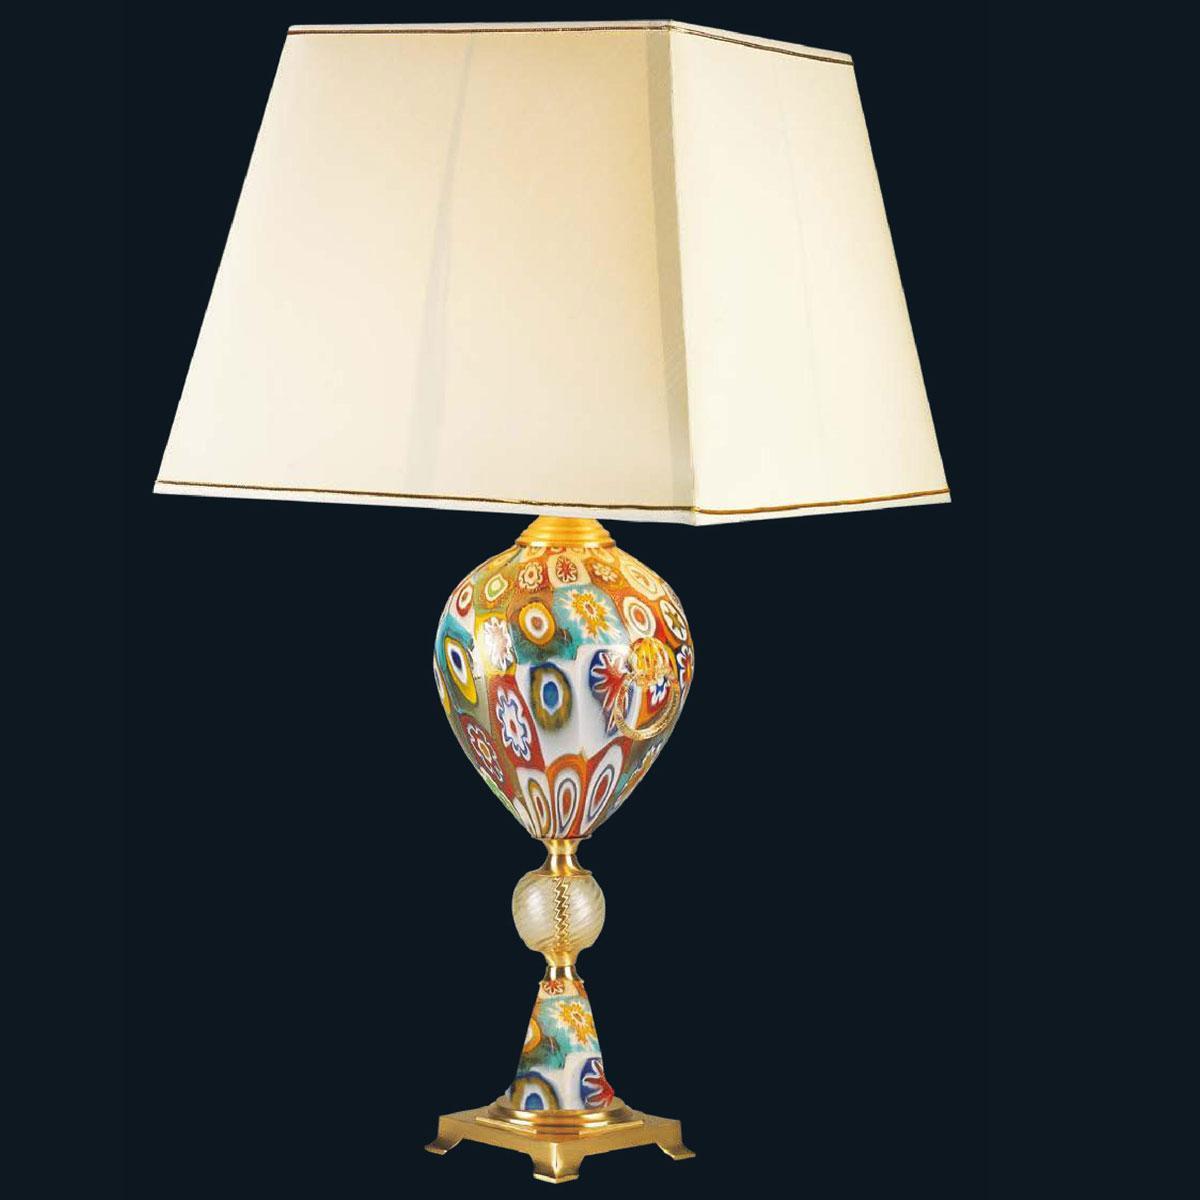 """Giselle"" Murano glass table lamp - 1 light - multicolor"